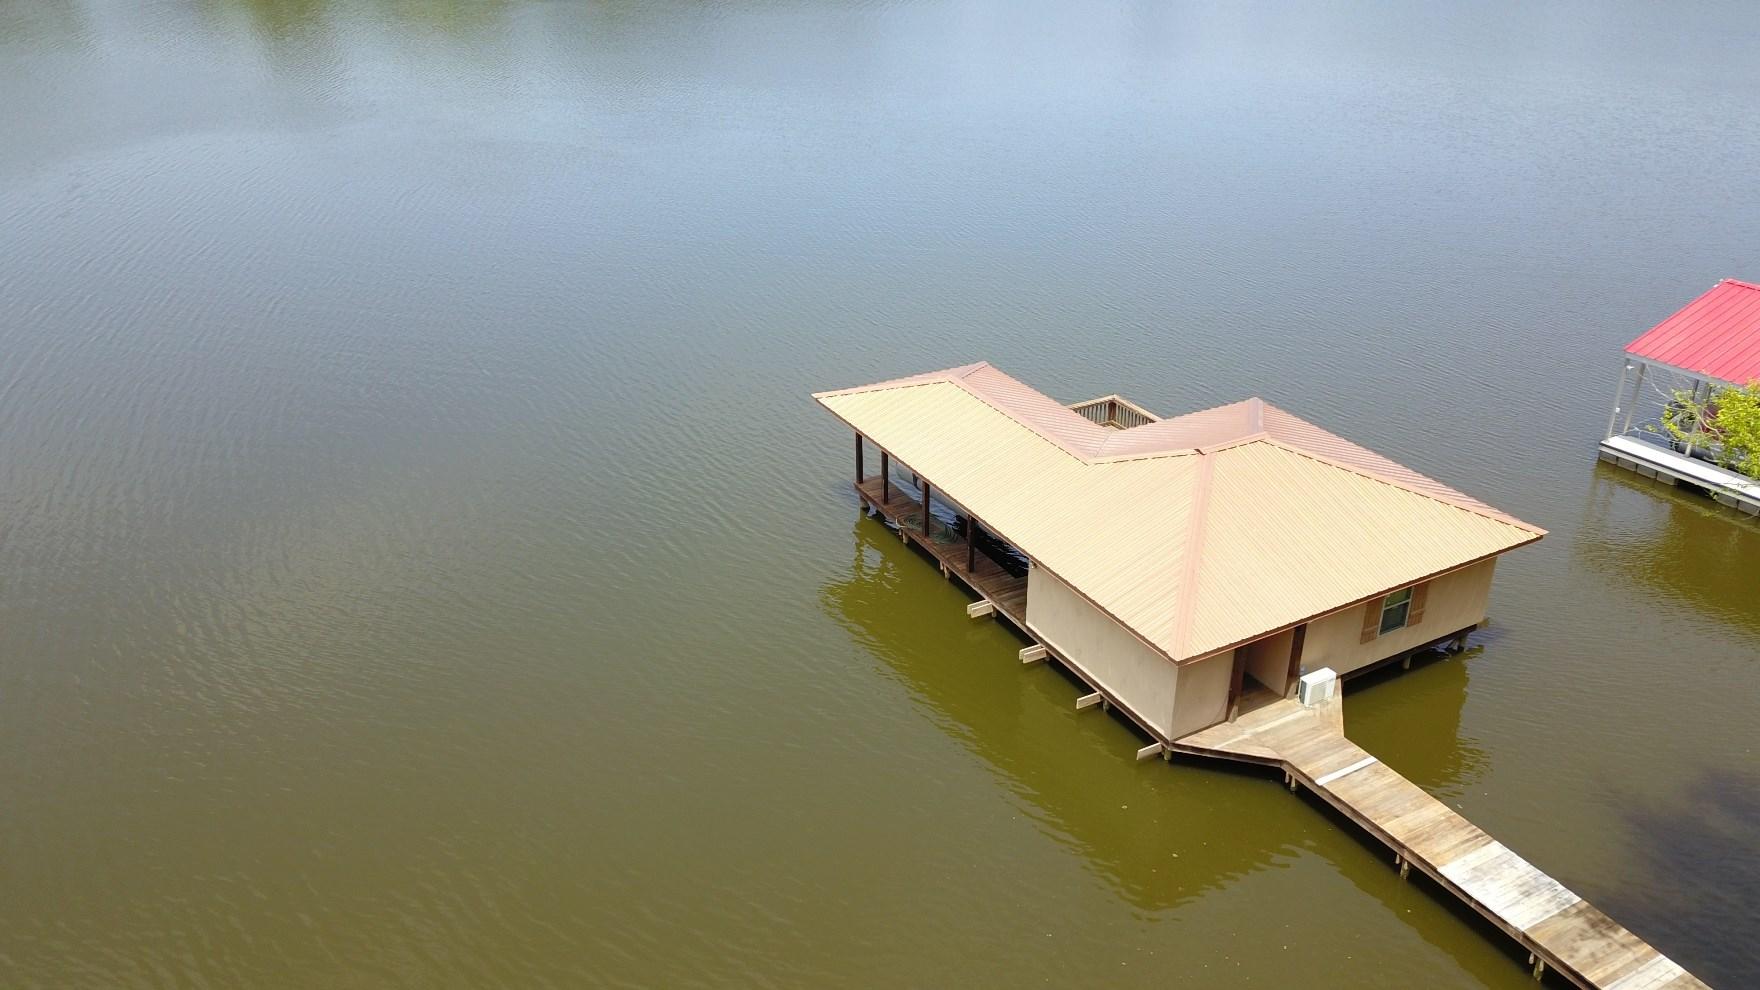 1/2 ACRE BOATHOUSE LOT IN WATER RIDGE ON LAKE PALESTINE!